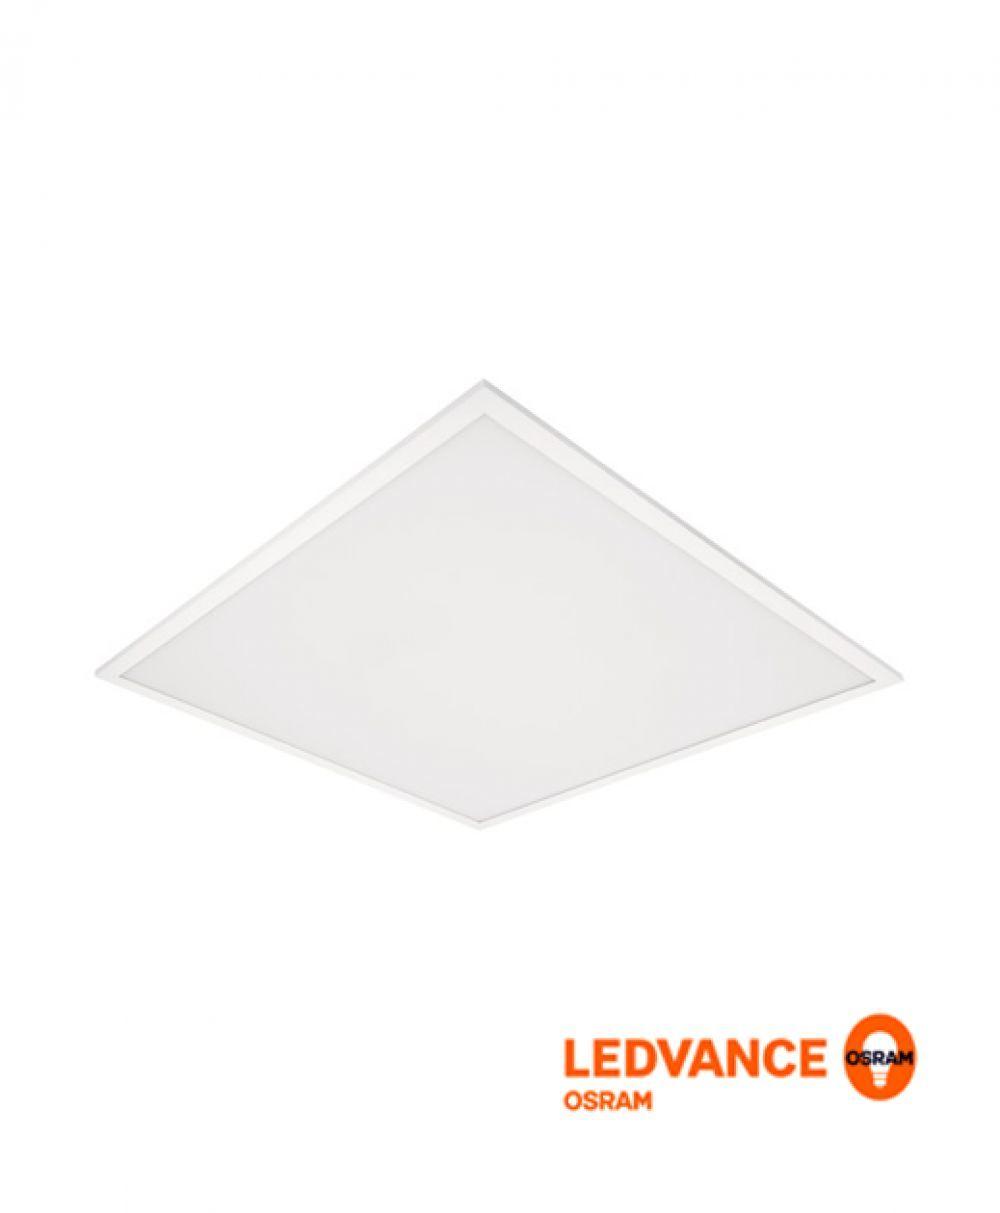 Full Size of Osram Led Panel 600x600 Planon Frameless 1200x300mm 60w 3000k Pure Light 300x600mm List 32w Ledvance 40w (600 X 600mm) Plus Surface Mount Kit 60x60 600 Sva Alt Wohnzimmer Osram Led Panel